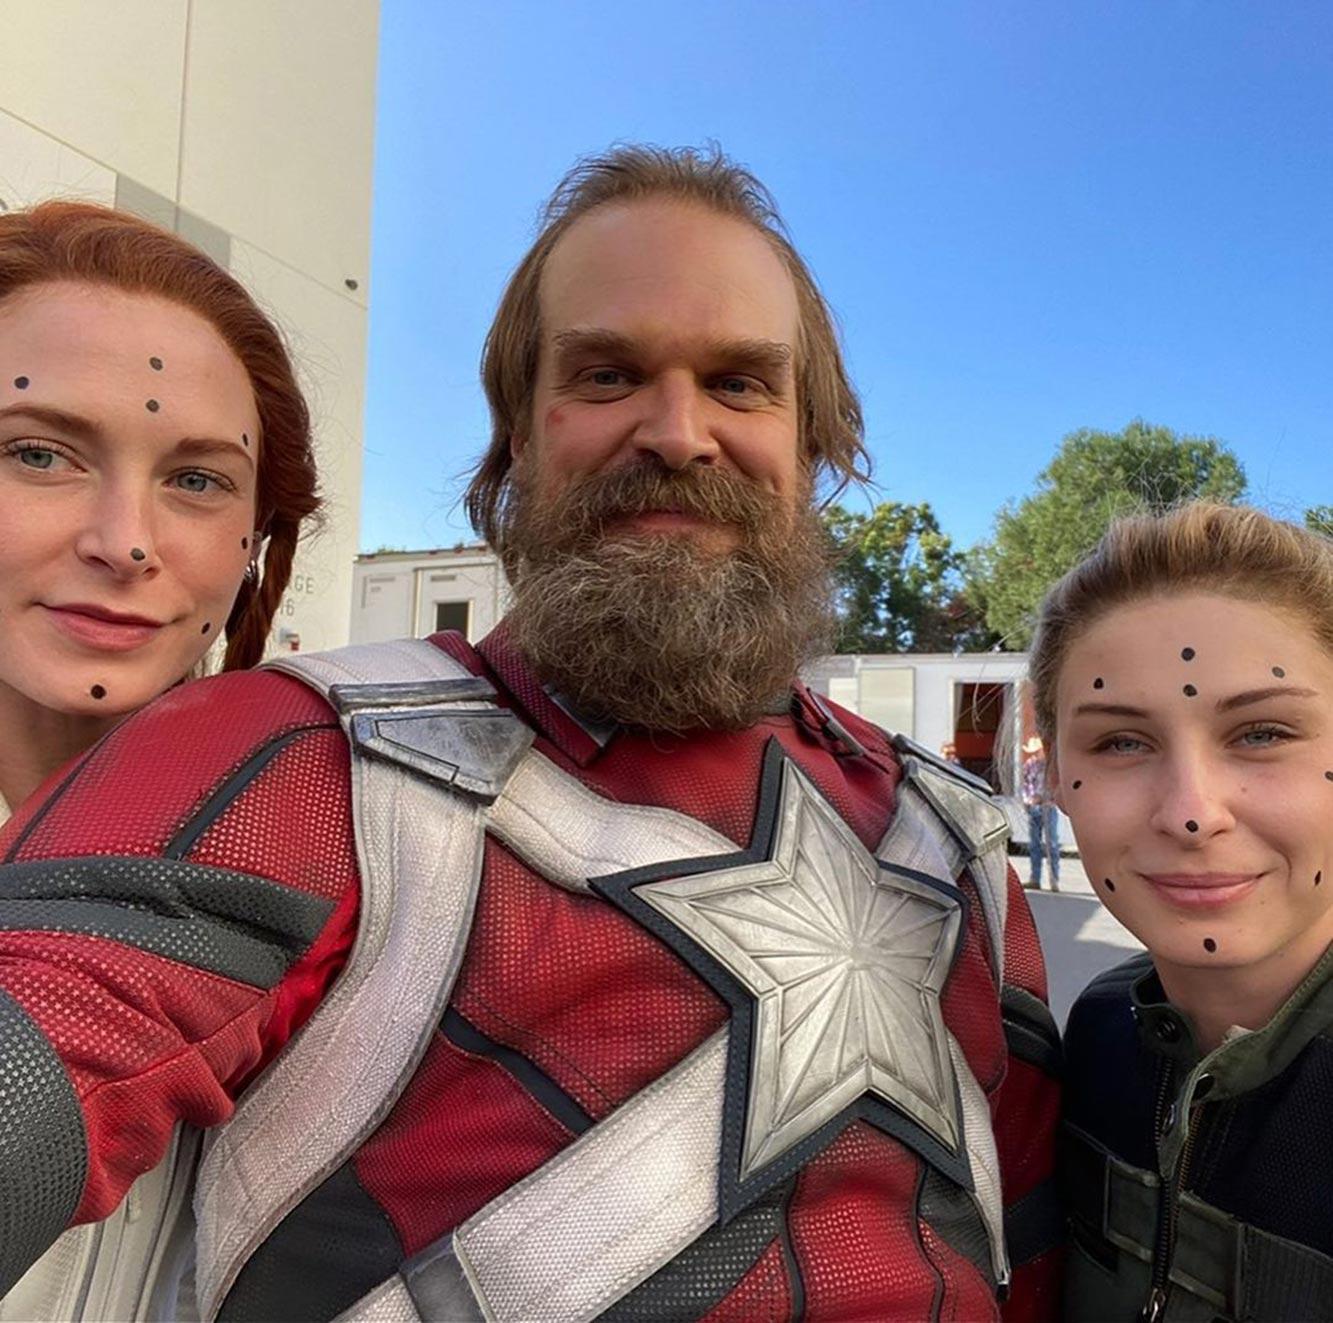 David Harbour on the set of Black Widow with Natasha and Yelena stunt doubles